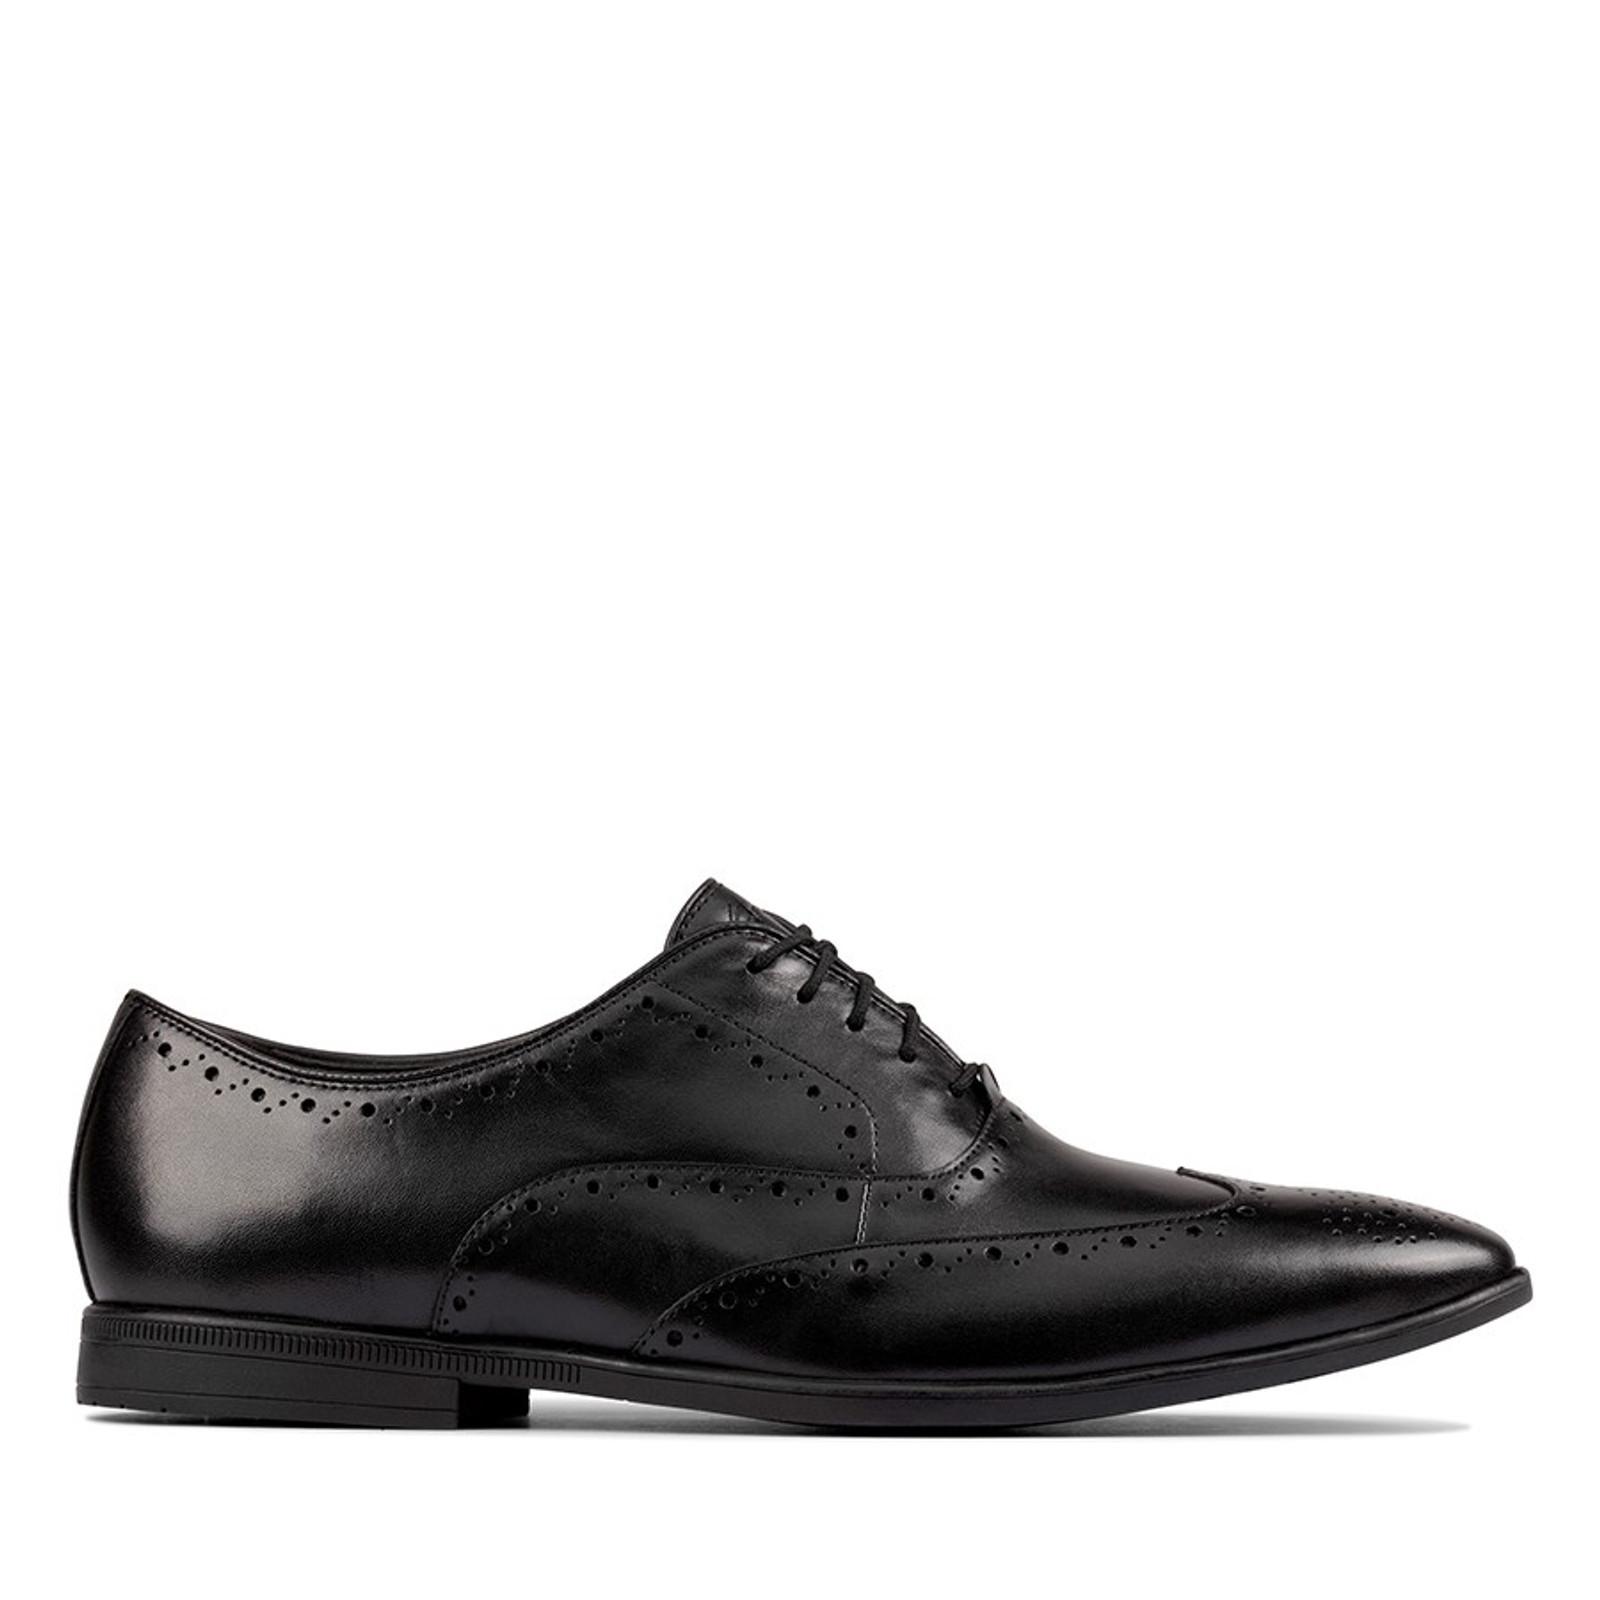 Clarks Mens BAMPTON RHODES Black Leather